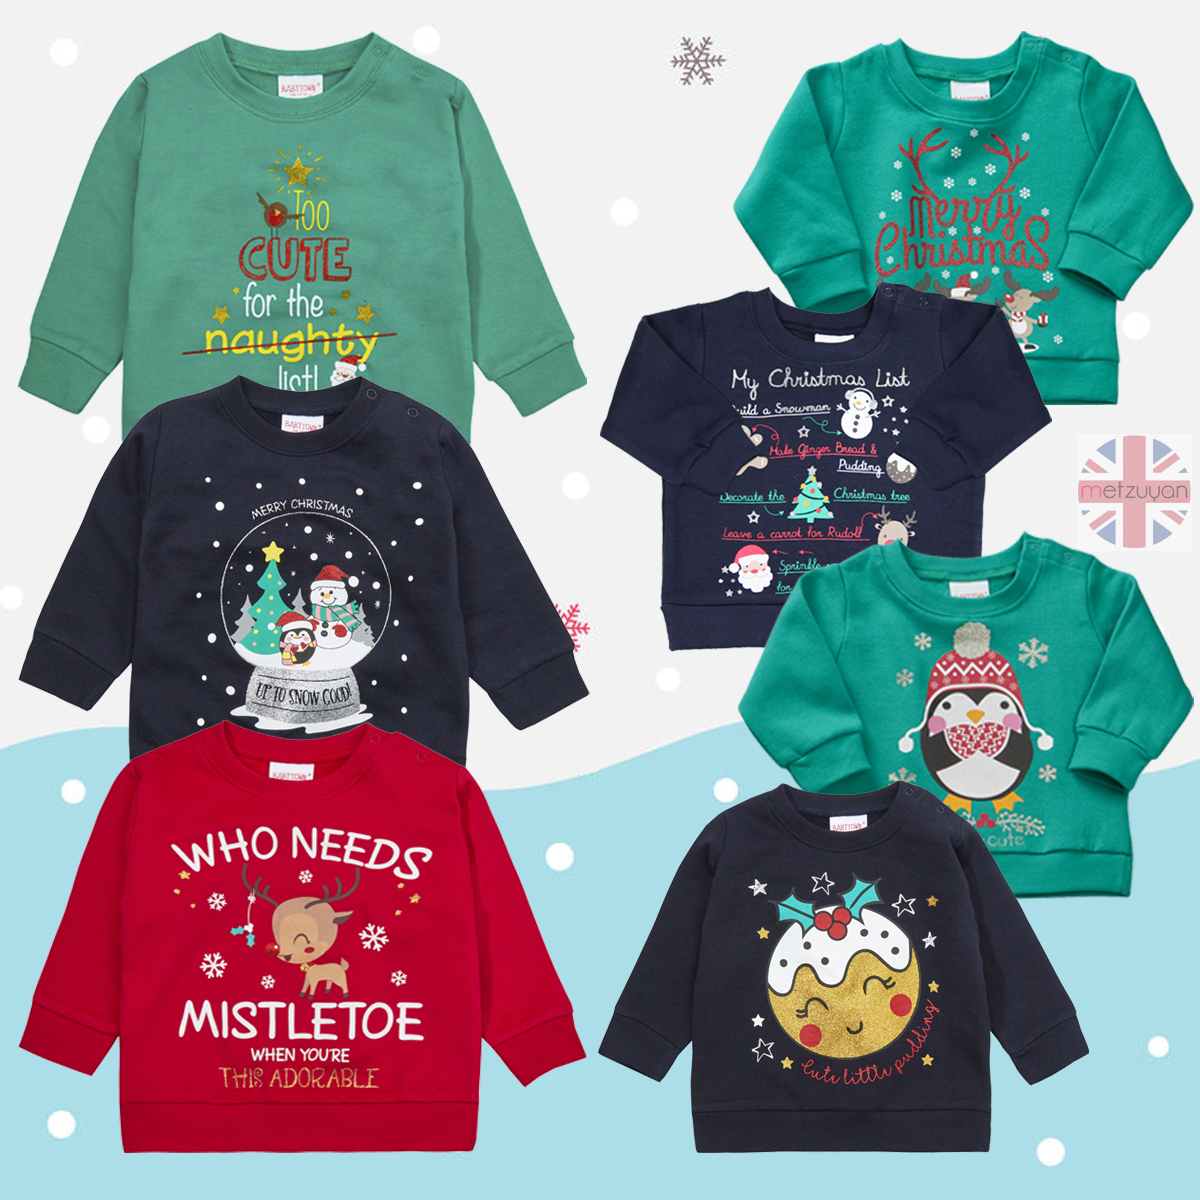 Babytown Girls Cotton Short Sleeve Printed Novelty T-Shirt